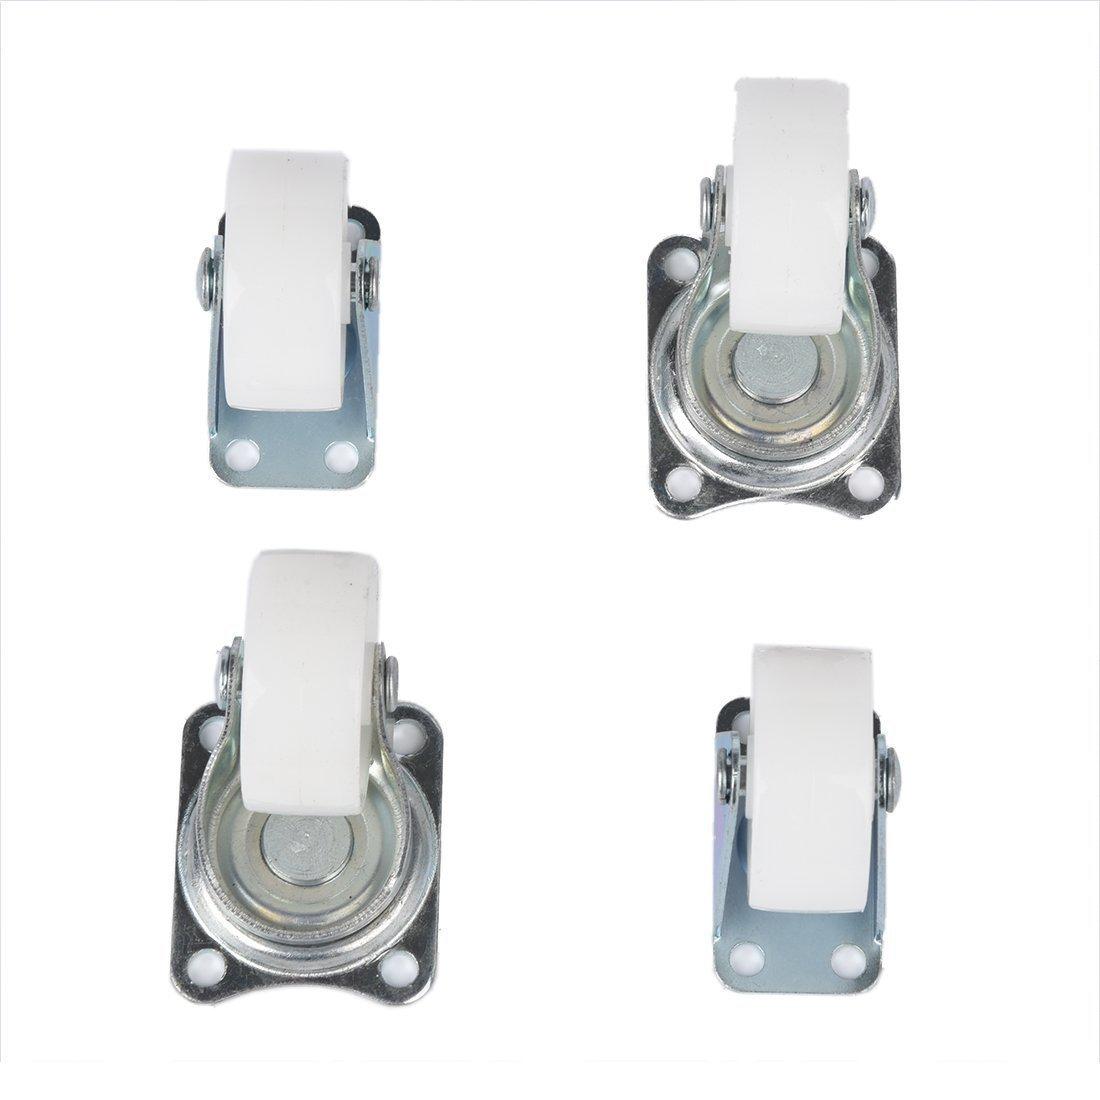 "TOOGOO(R) 1.5"" White Wheel Silver Tone Metal Top Plate Fixed Swivel Caster Set 4 Pcs"